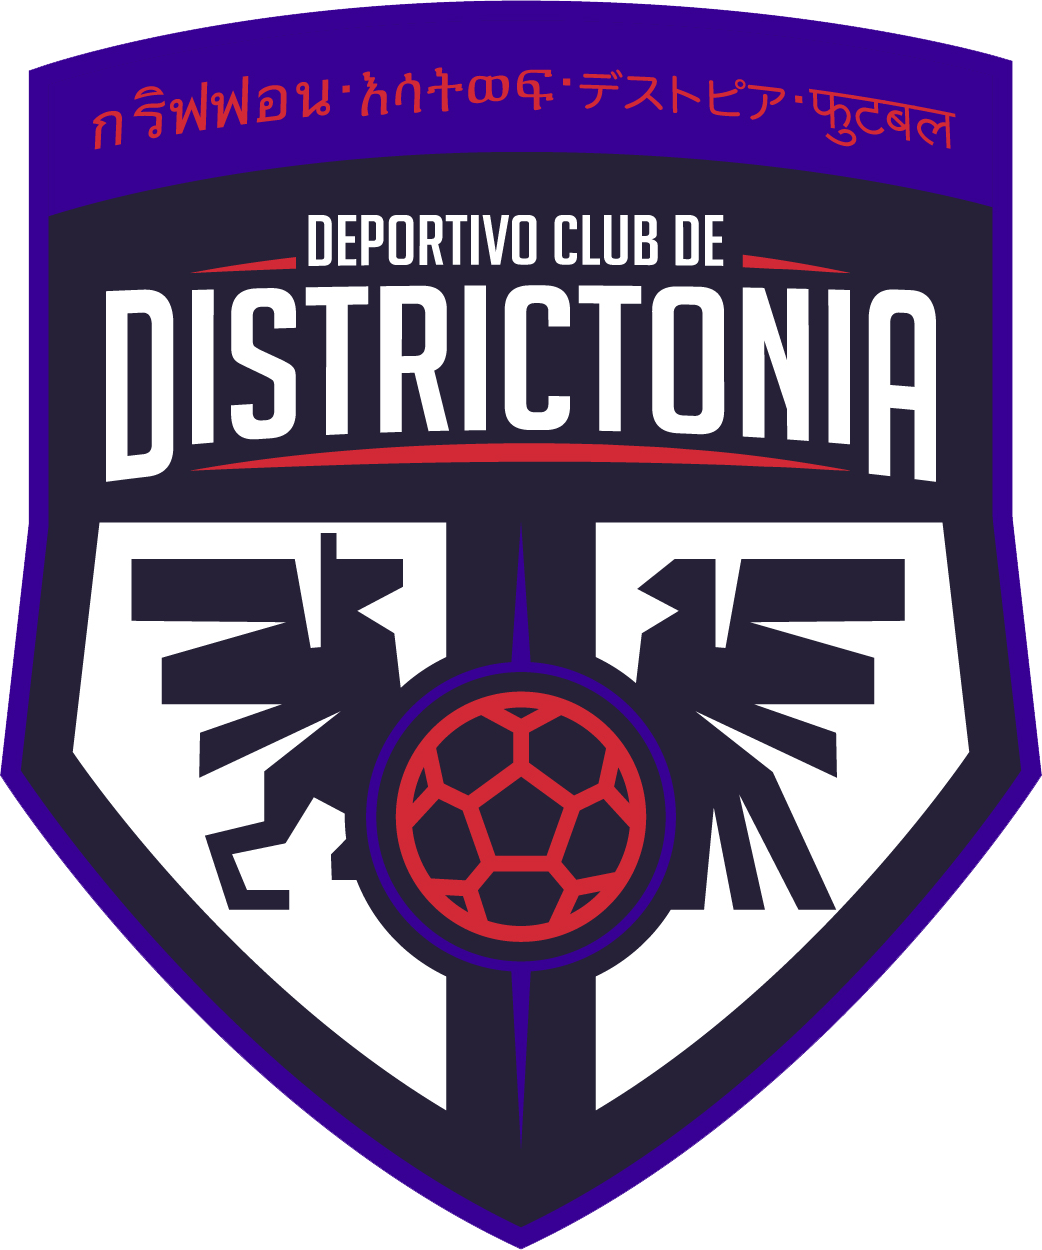 Districtonia